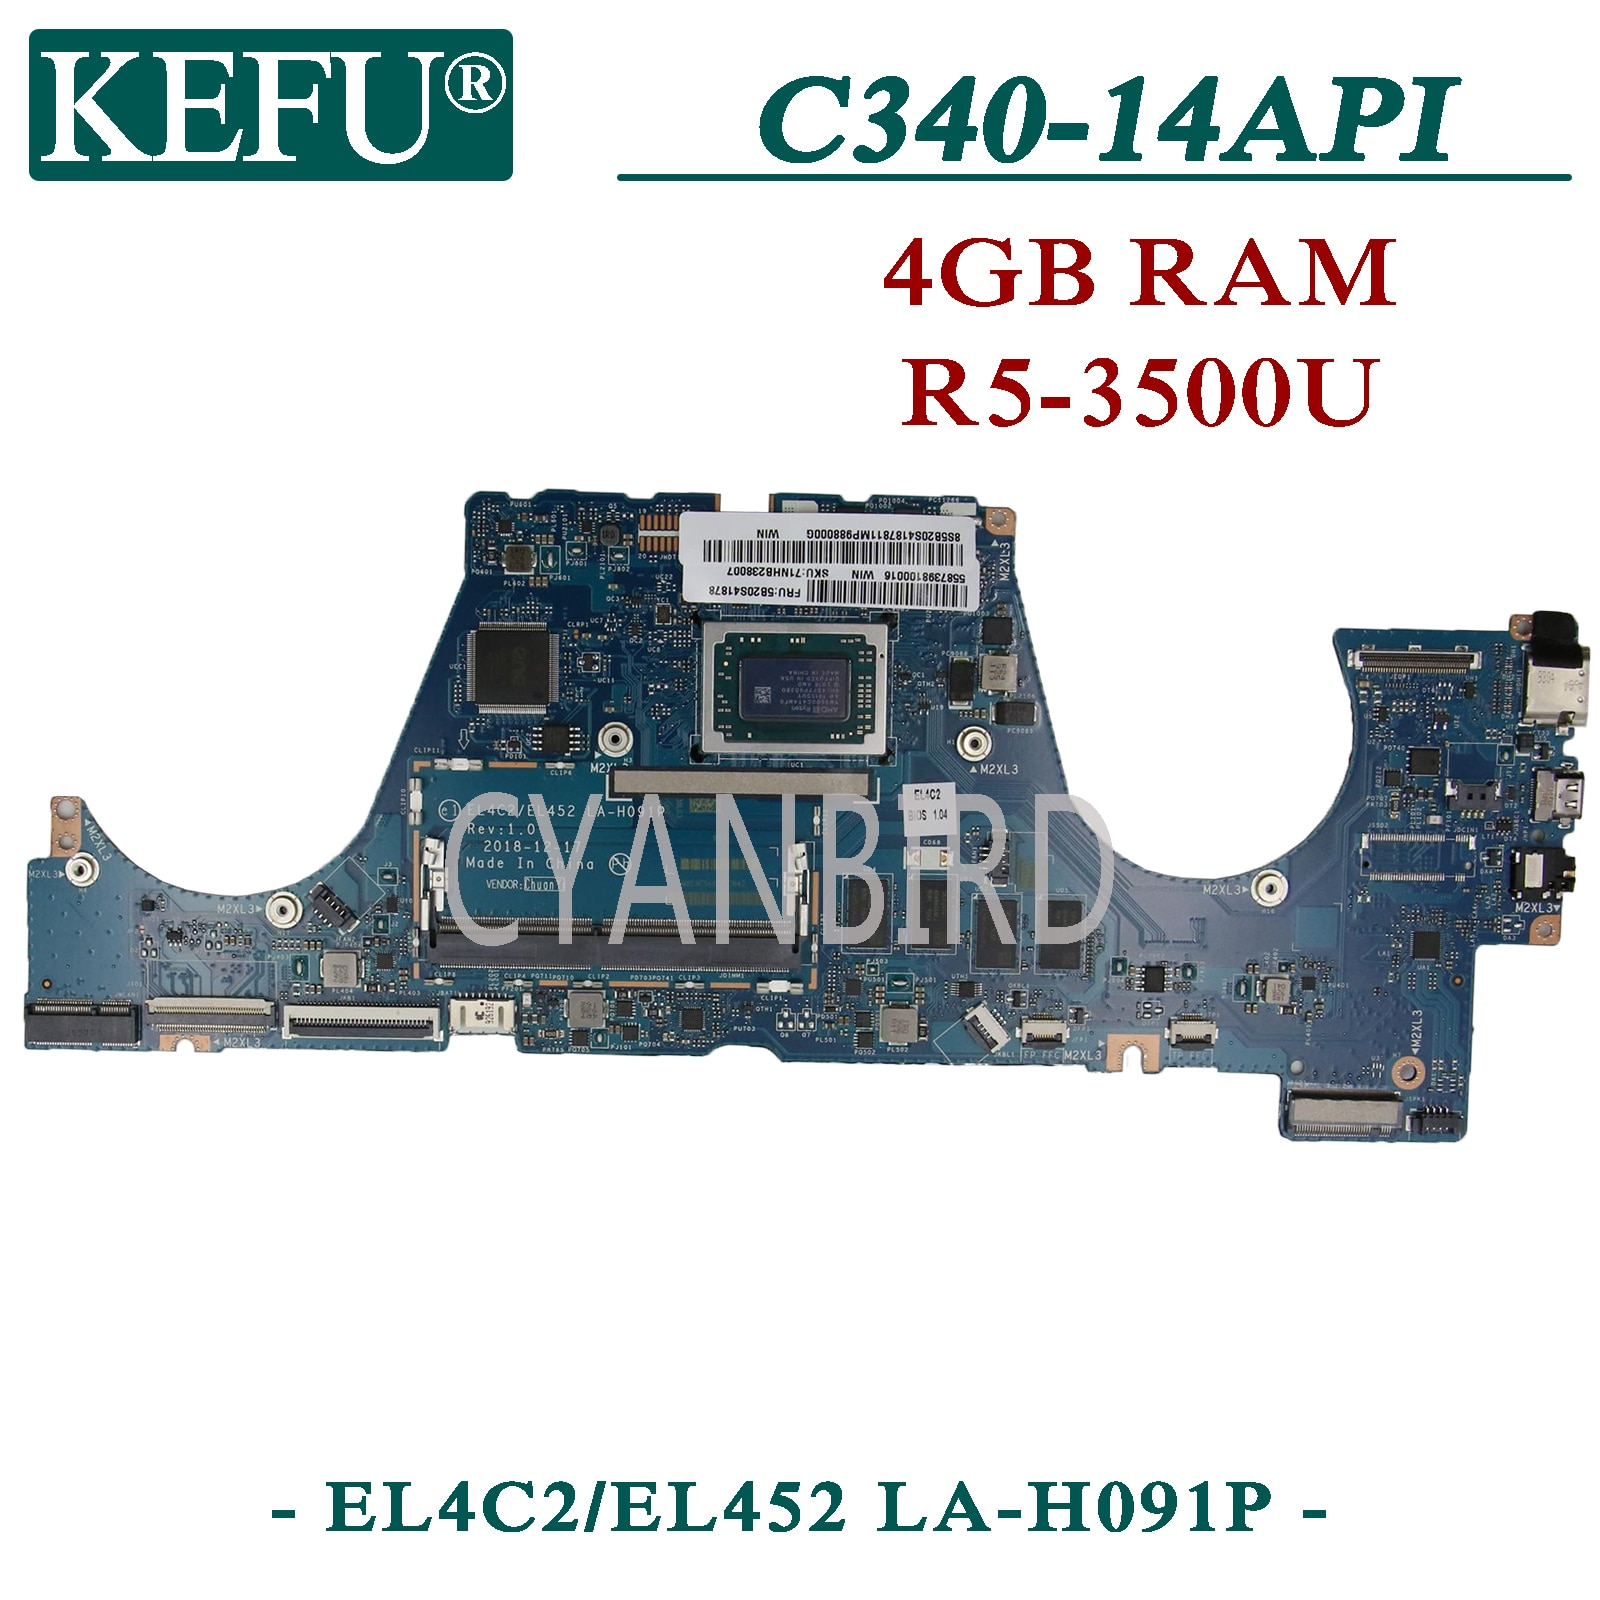 KEFU EL4C2/EL452 LA-H091P اللوحة الأصلية لينوفو C340-14API S540-14API FLEX-14API مع 4G-RAM R5-3500U اللوحة المحمول